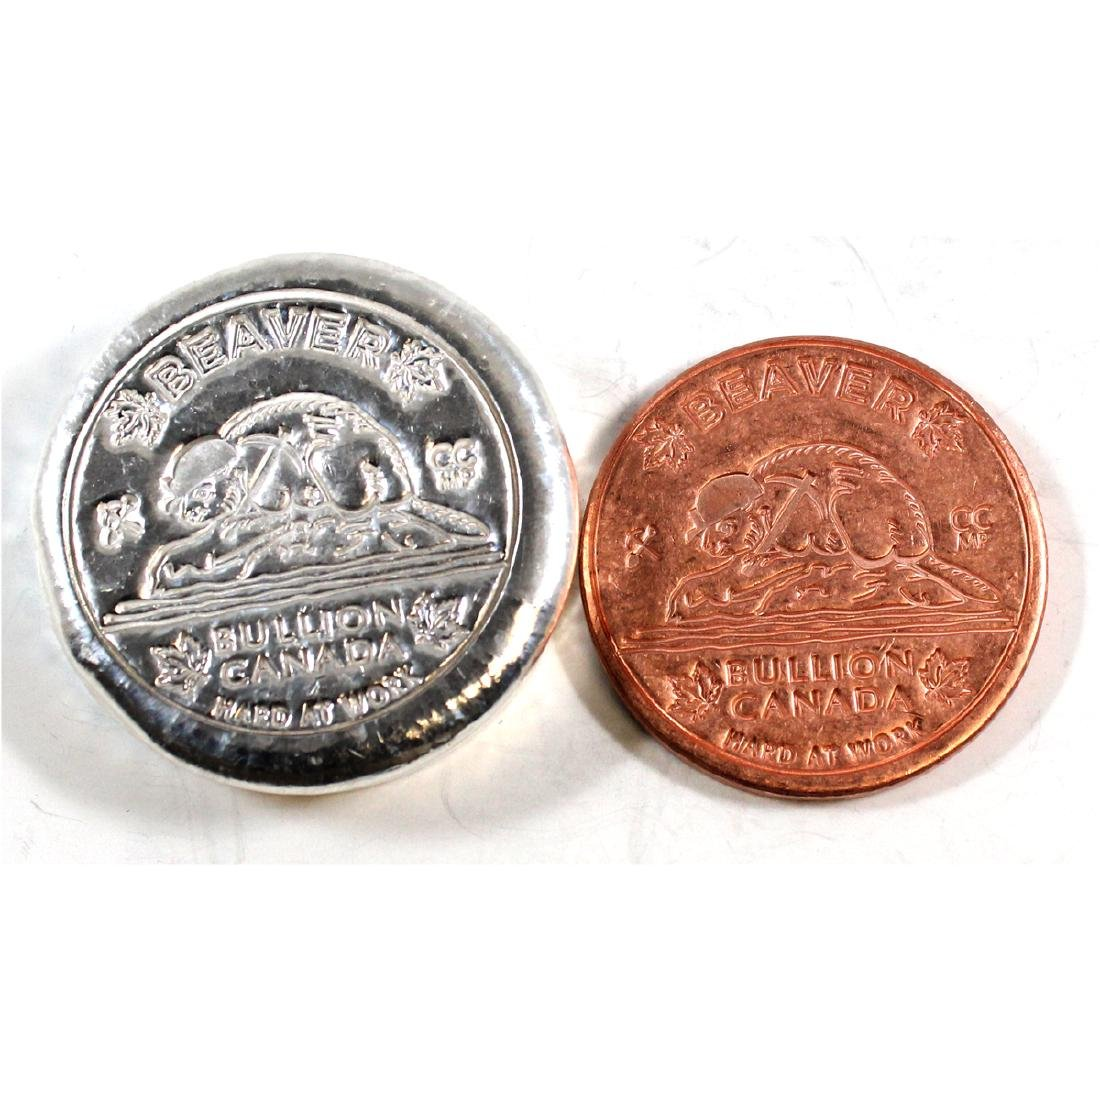 Limited Mintage! Beaver Bullion 'Hard at Work' 5oz Fine